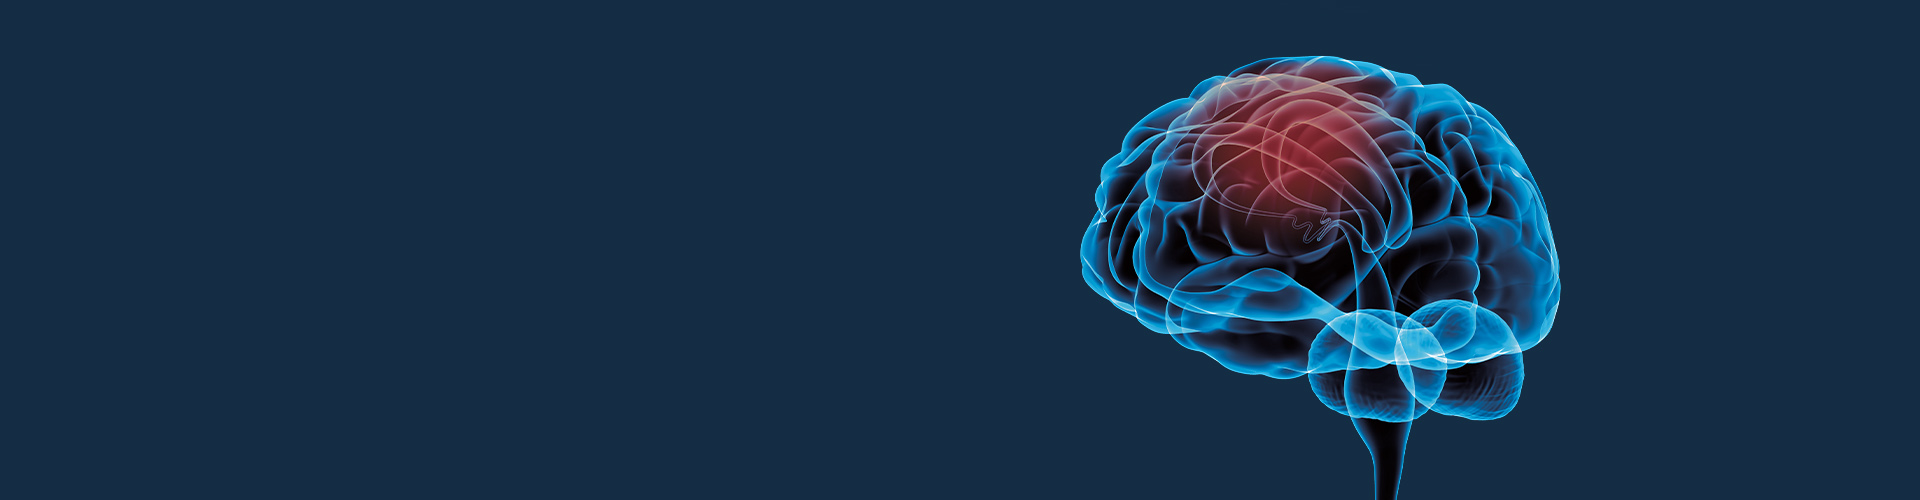 STIWELL Neurorehabilitation | applications in neurology